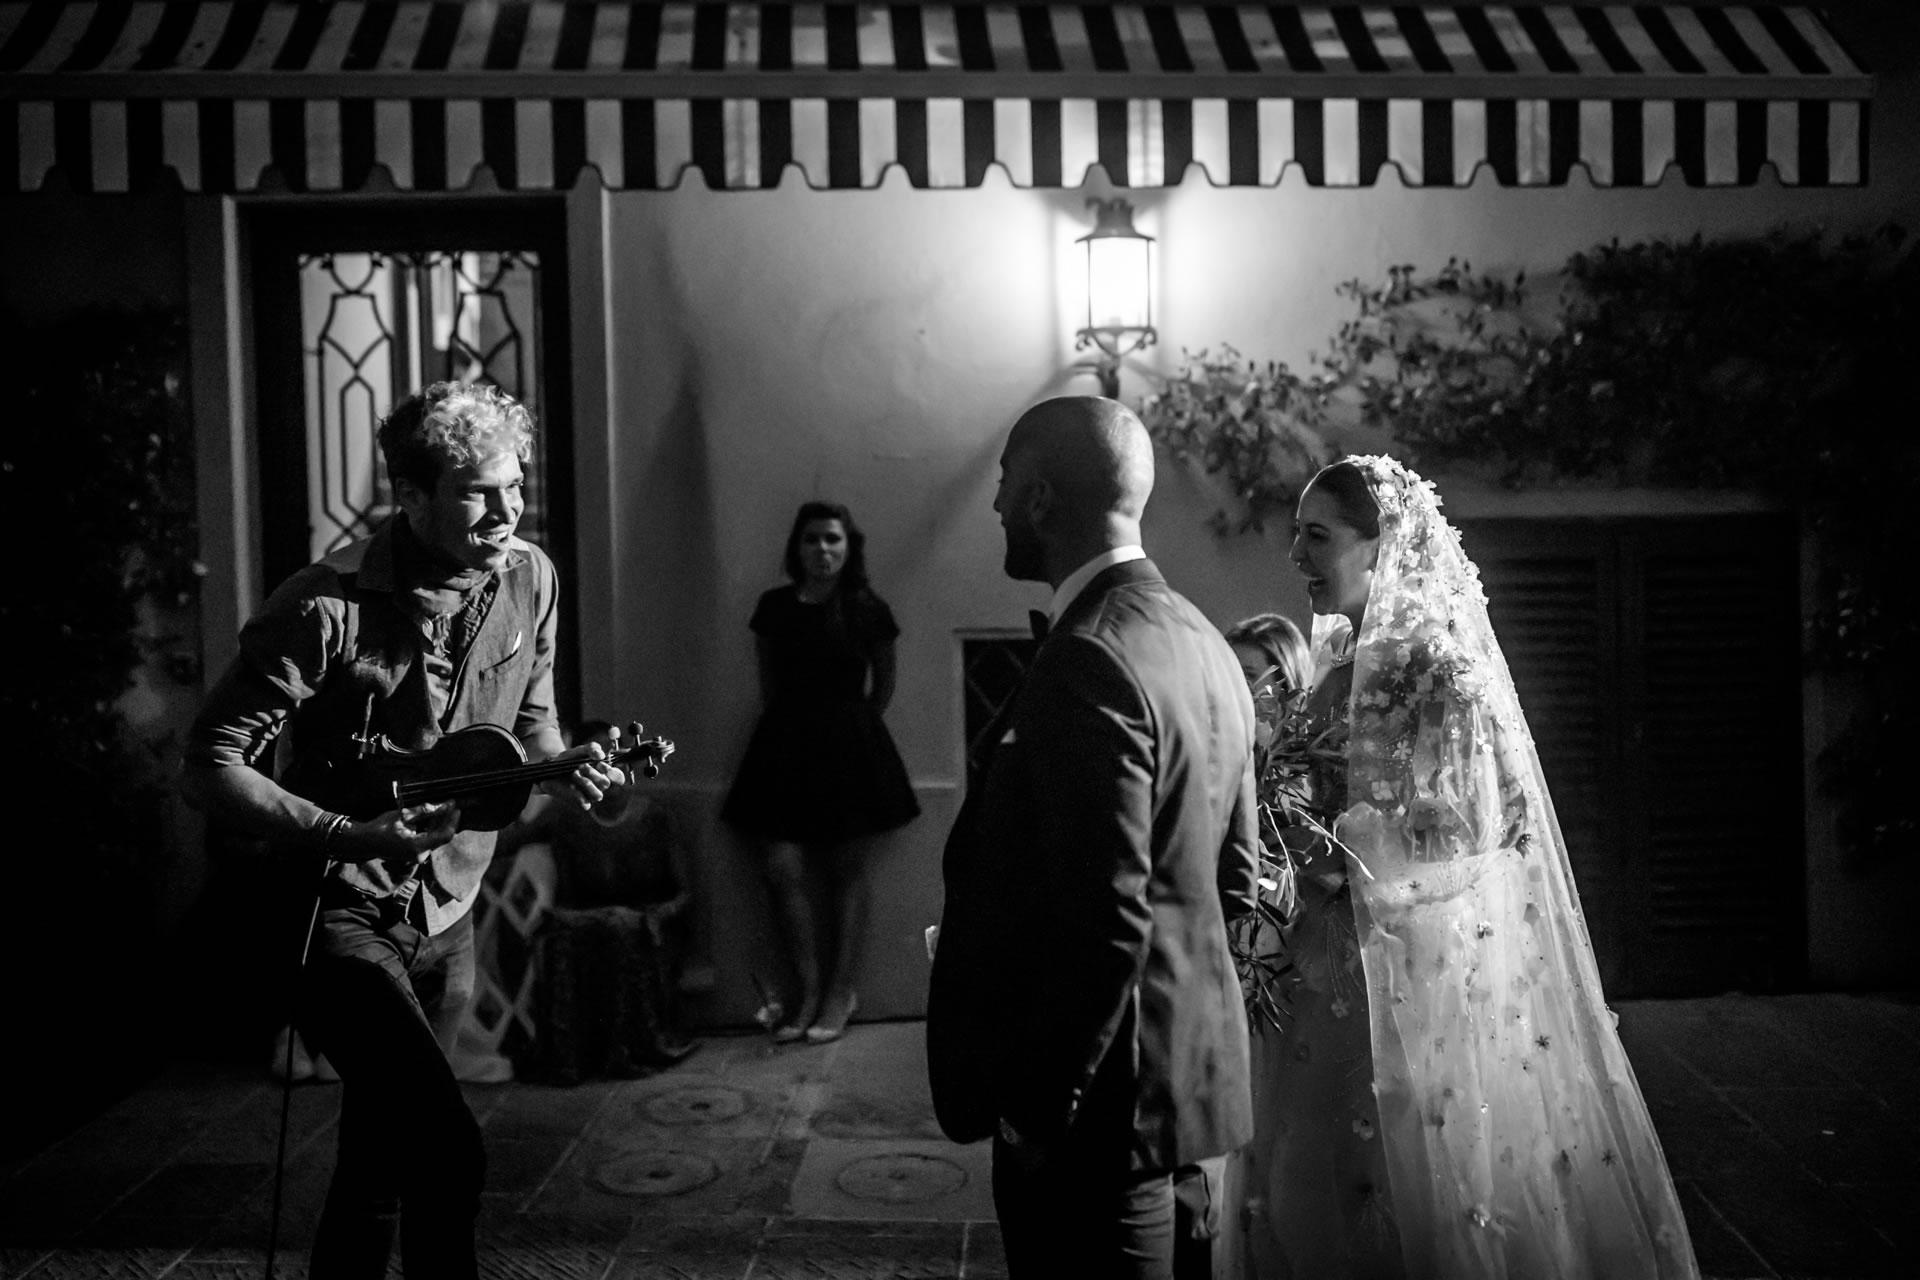 Guitar - 42 :: Luxury wedding at Il Borro :: Luxury wedding photography - 41 :: Guitar - 42